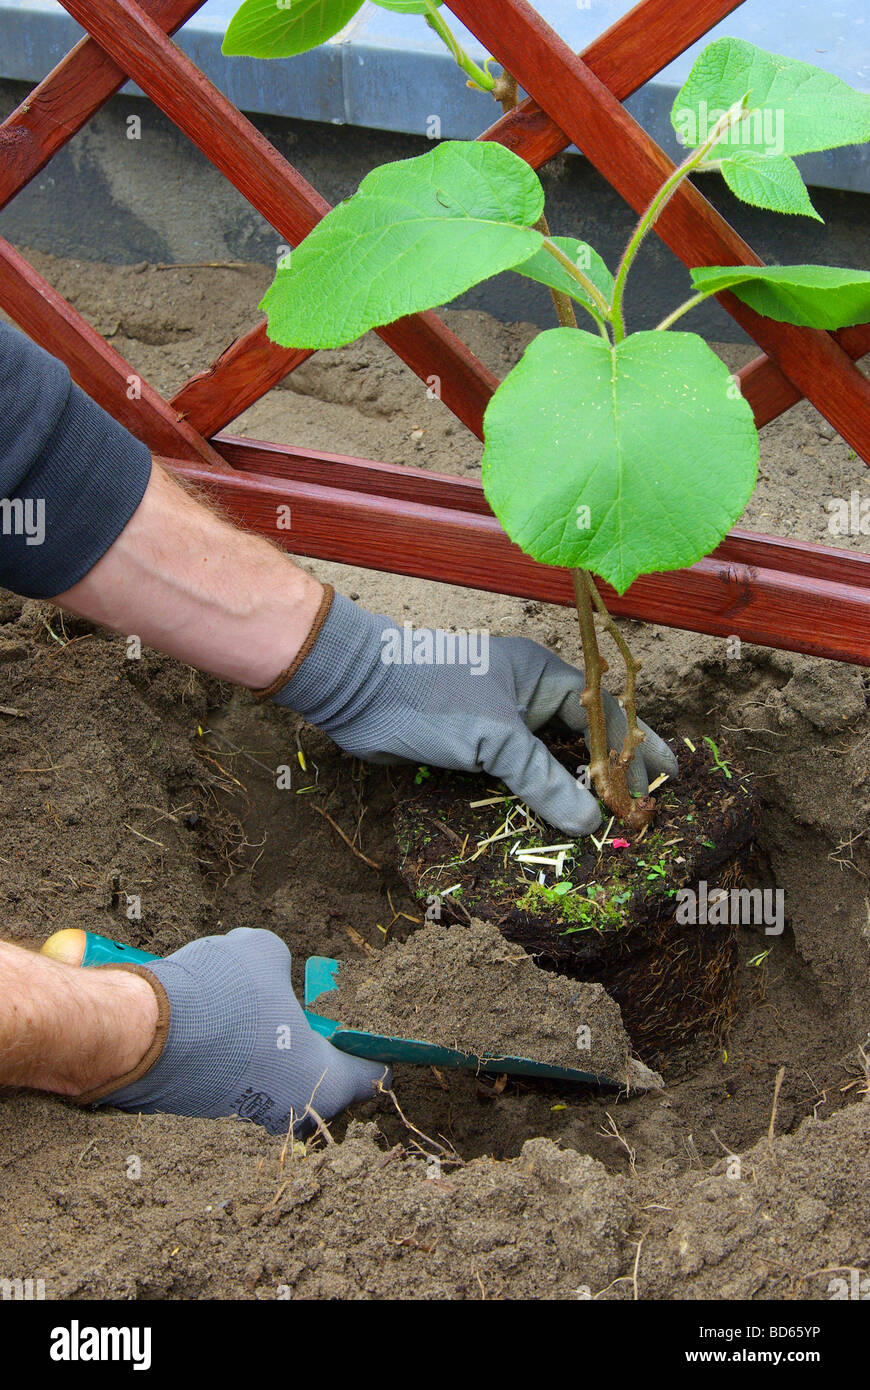 Kiwipflanze pflanzen planting a kiwi plant 03 - Stock Image